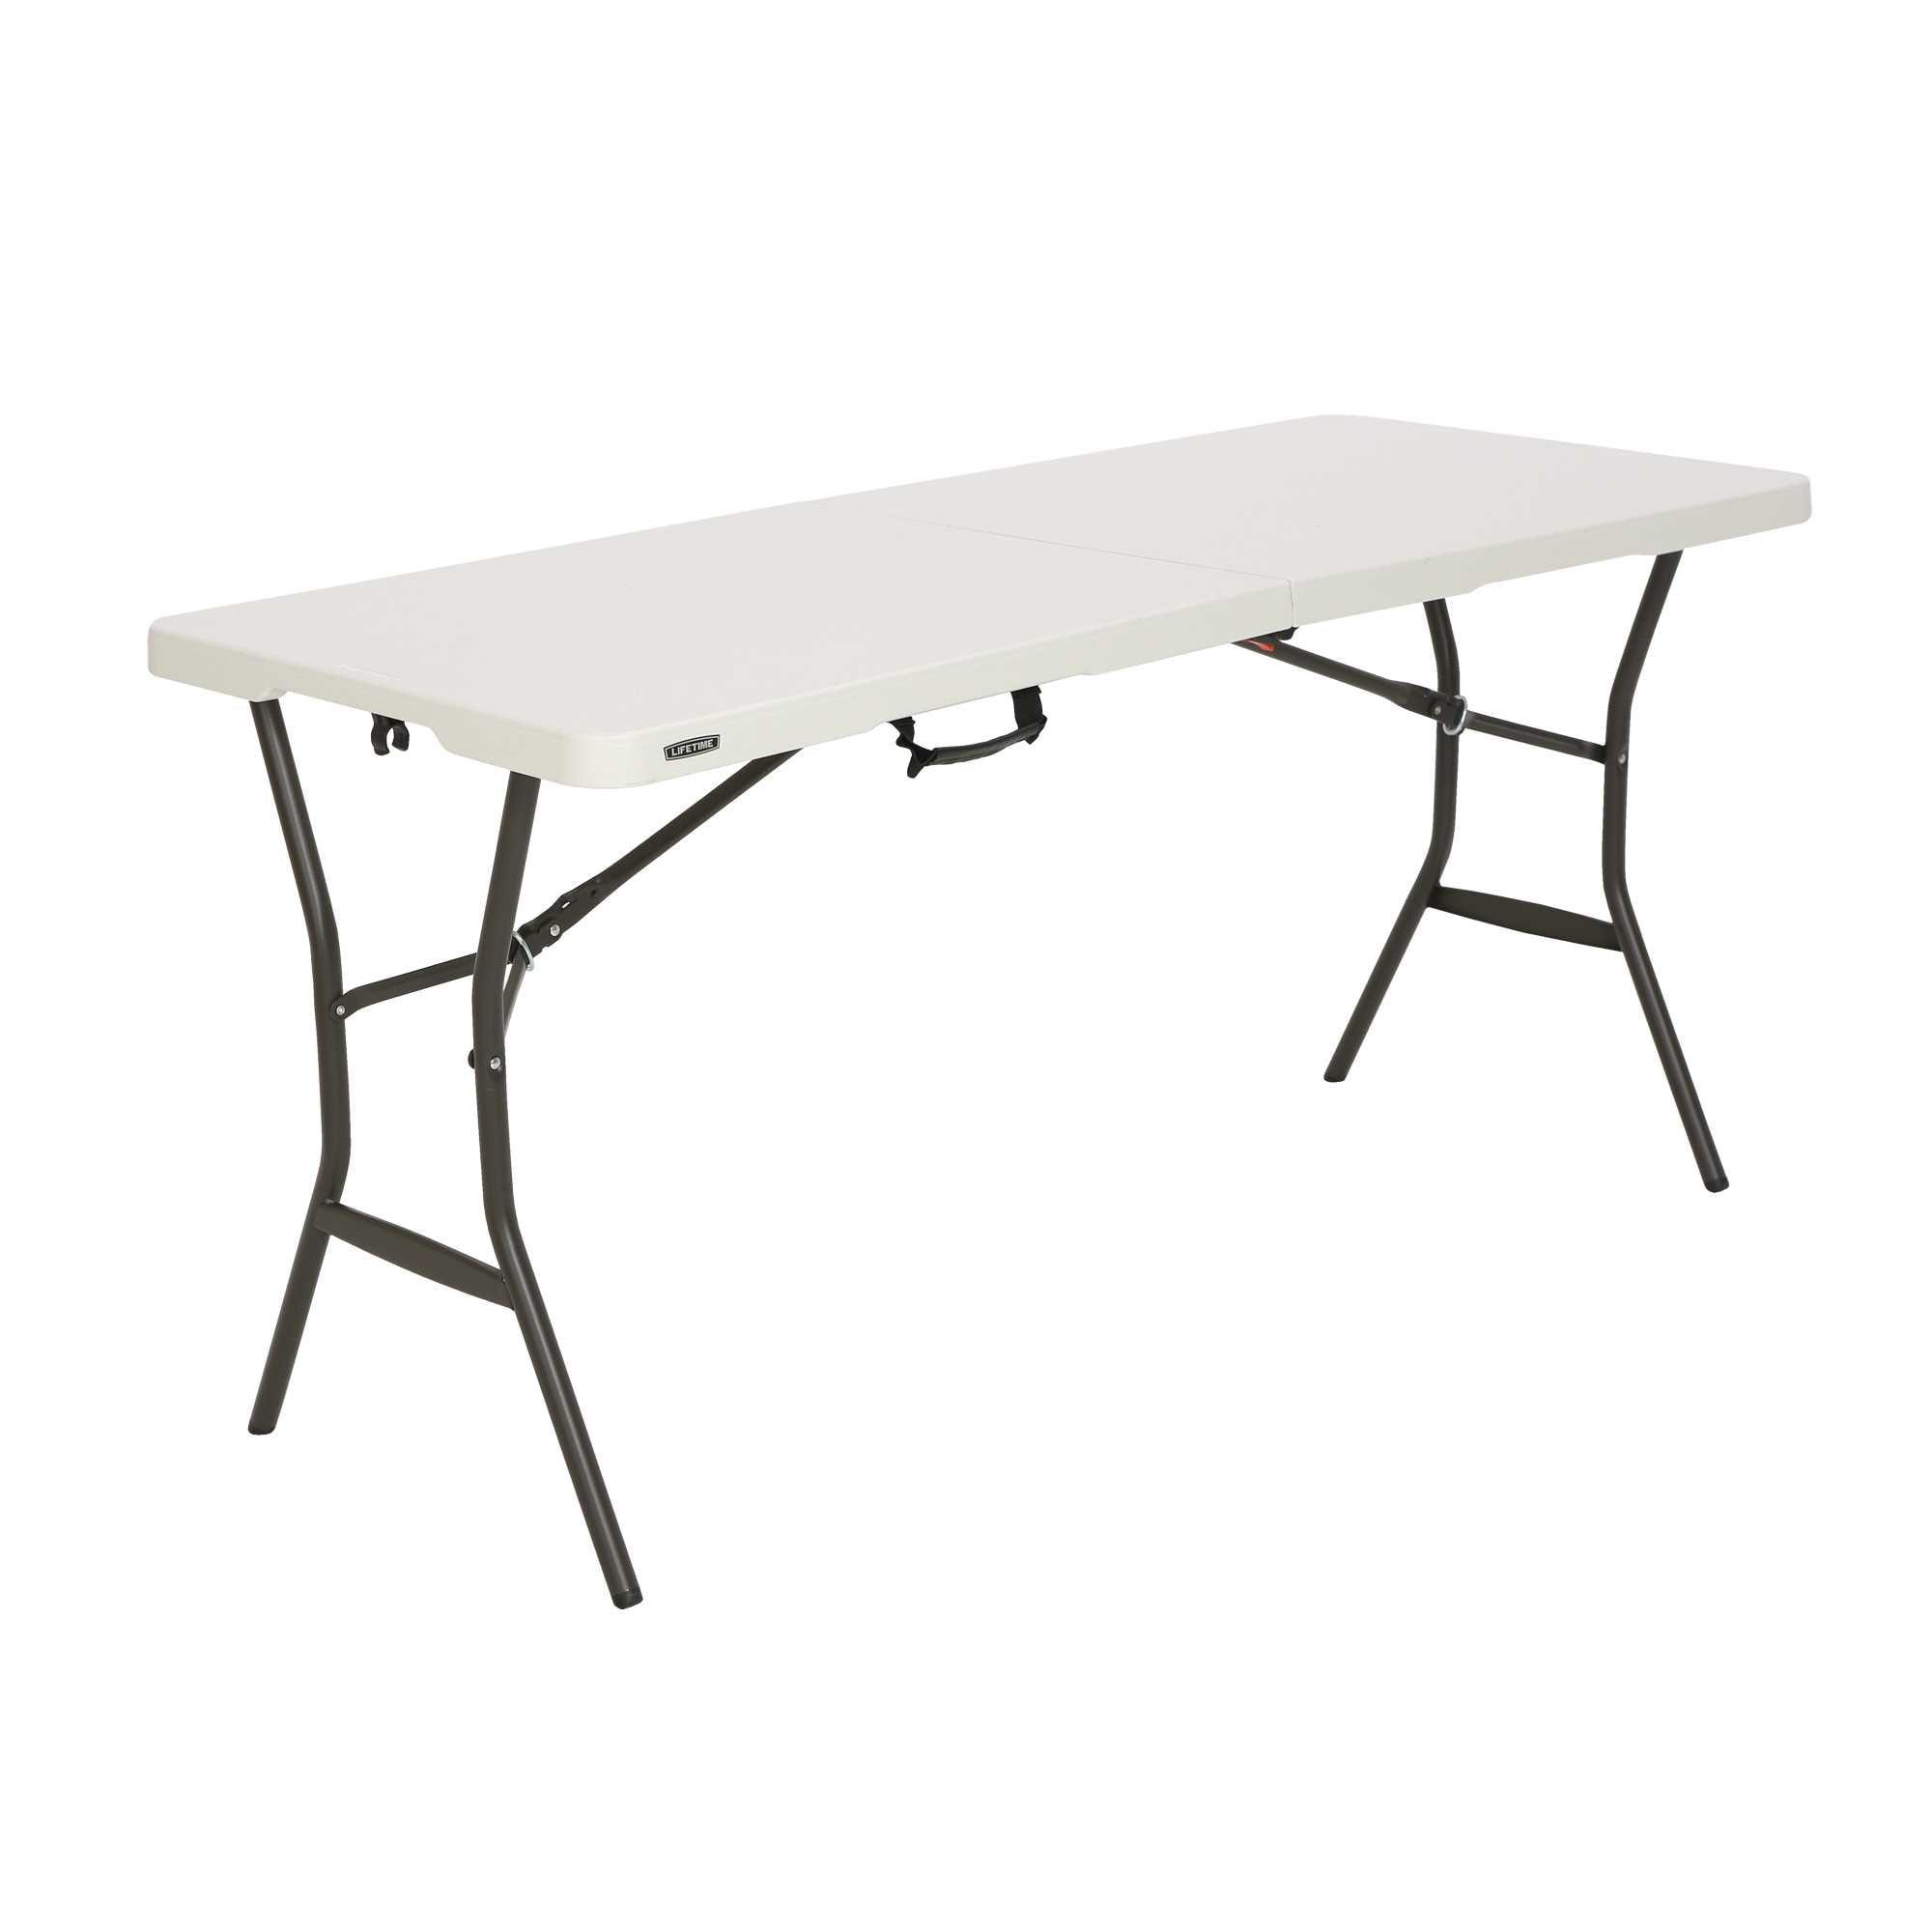 Table Lifetime